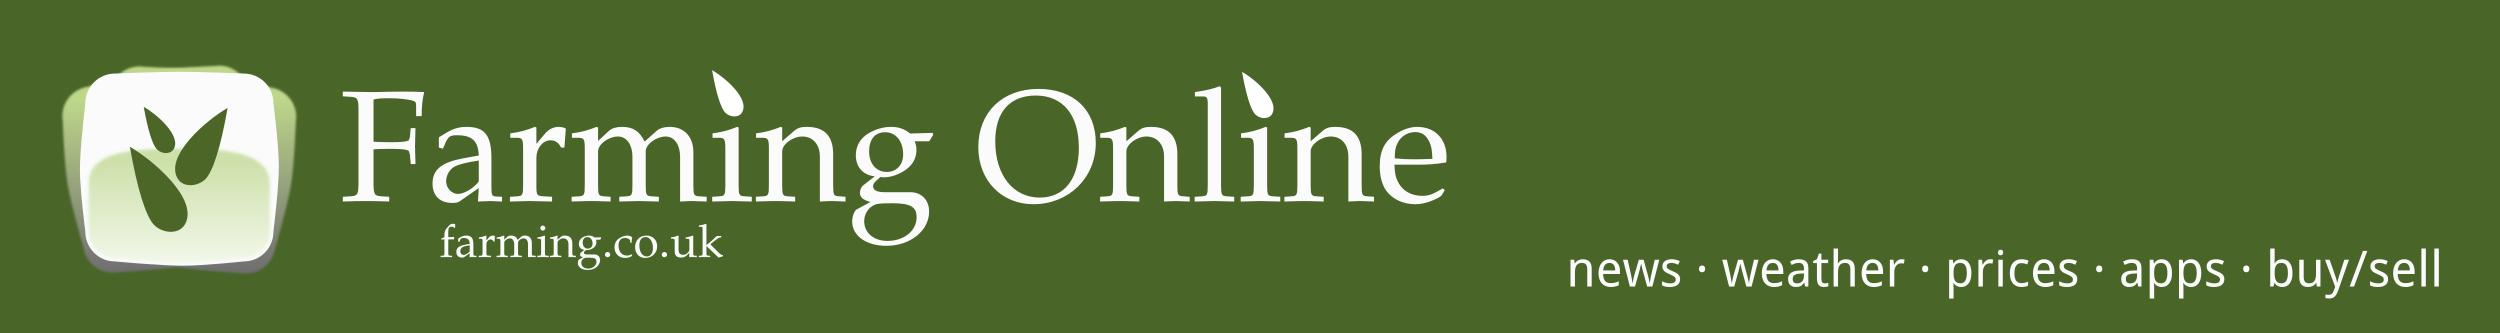 Farming Online